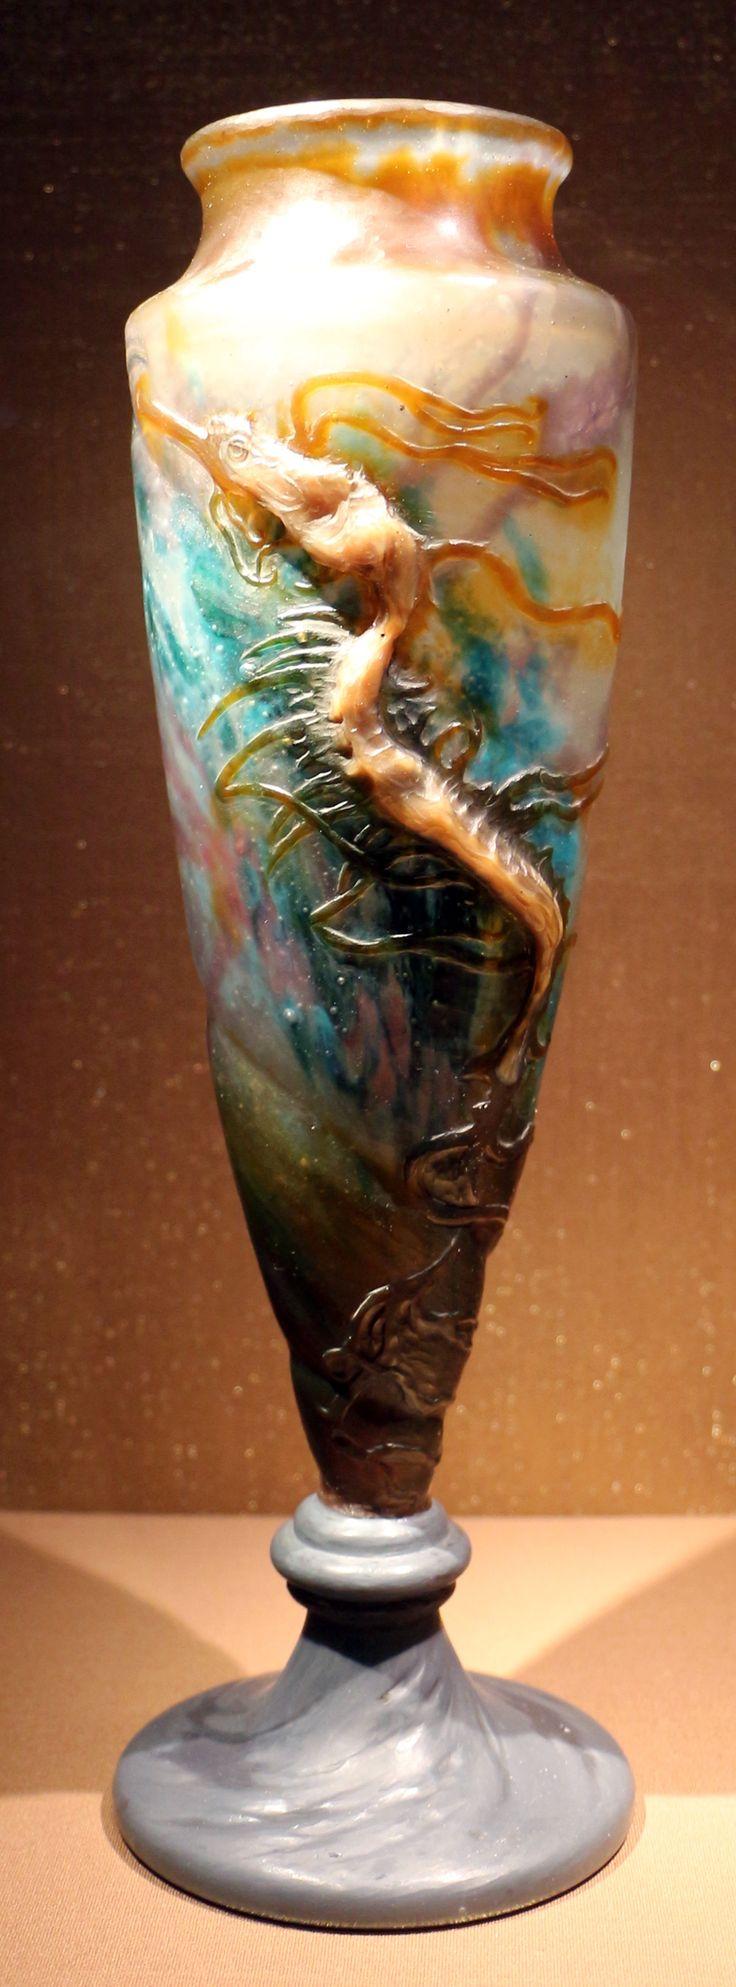 407 best nancy art nouveau glass images on pinterest art emile gall vaso ippocampo 1901 glass vaseart nouveauart decoart sculpturesjunk drawerpotsrarityantiquitieschandeliers reviewsmspy